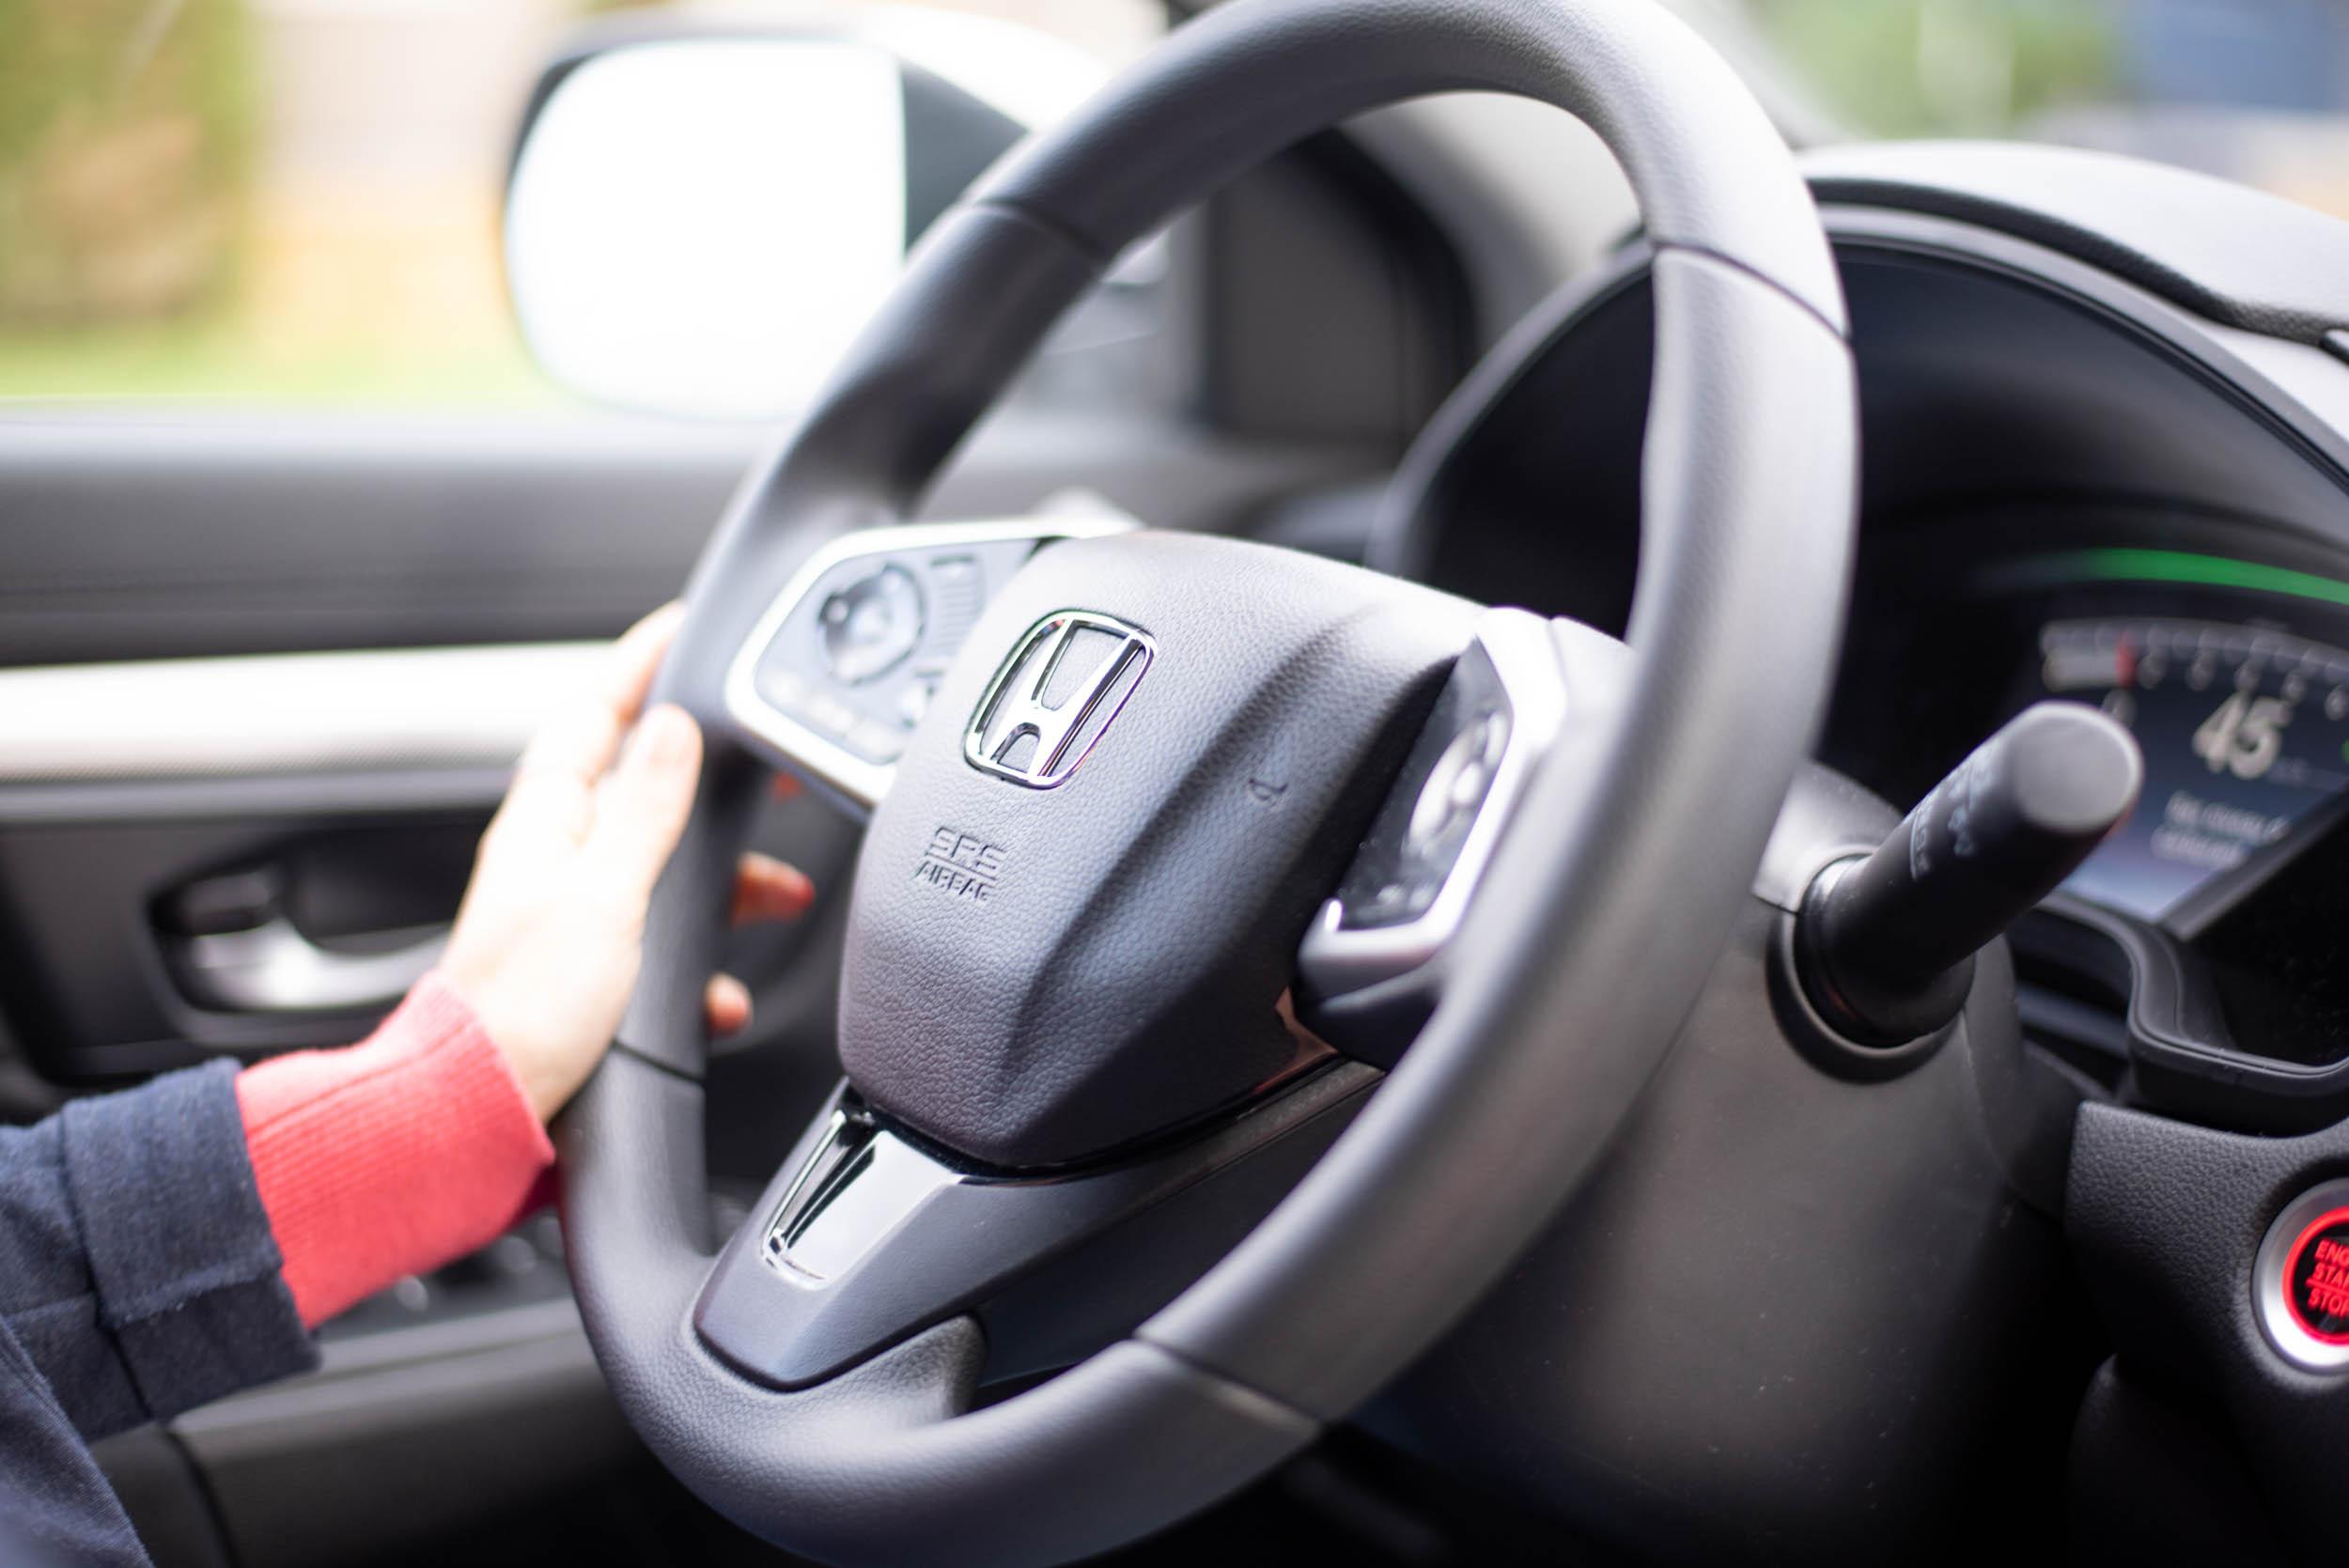 Honda-Honda CRV -Sherbrooke Honda-Magog Honda-Je suis une maman